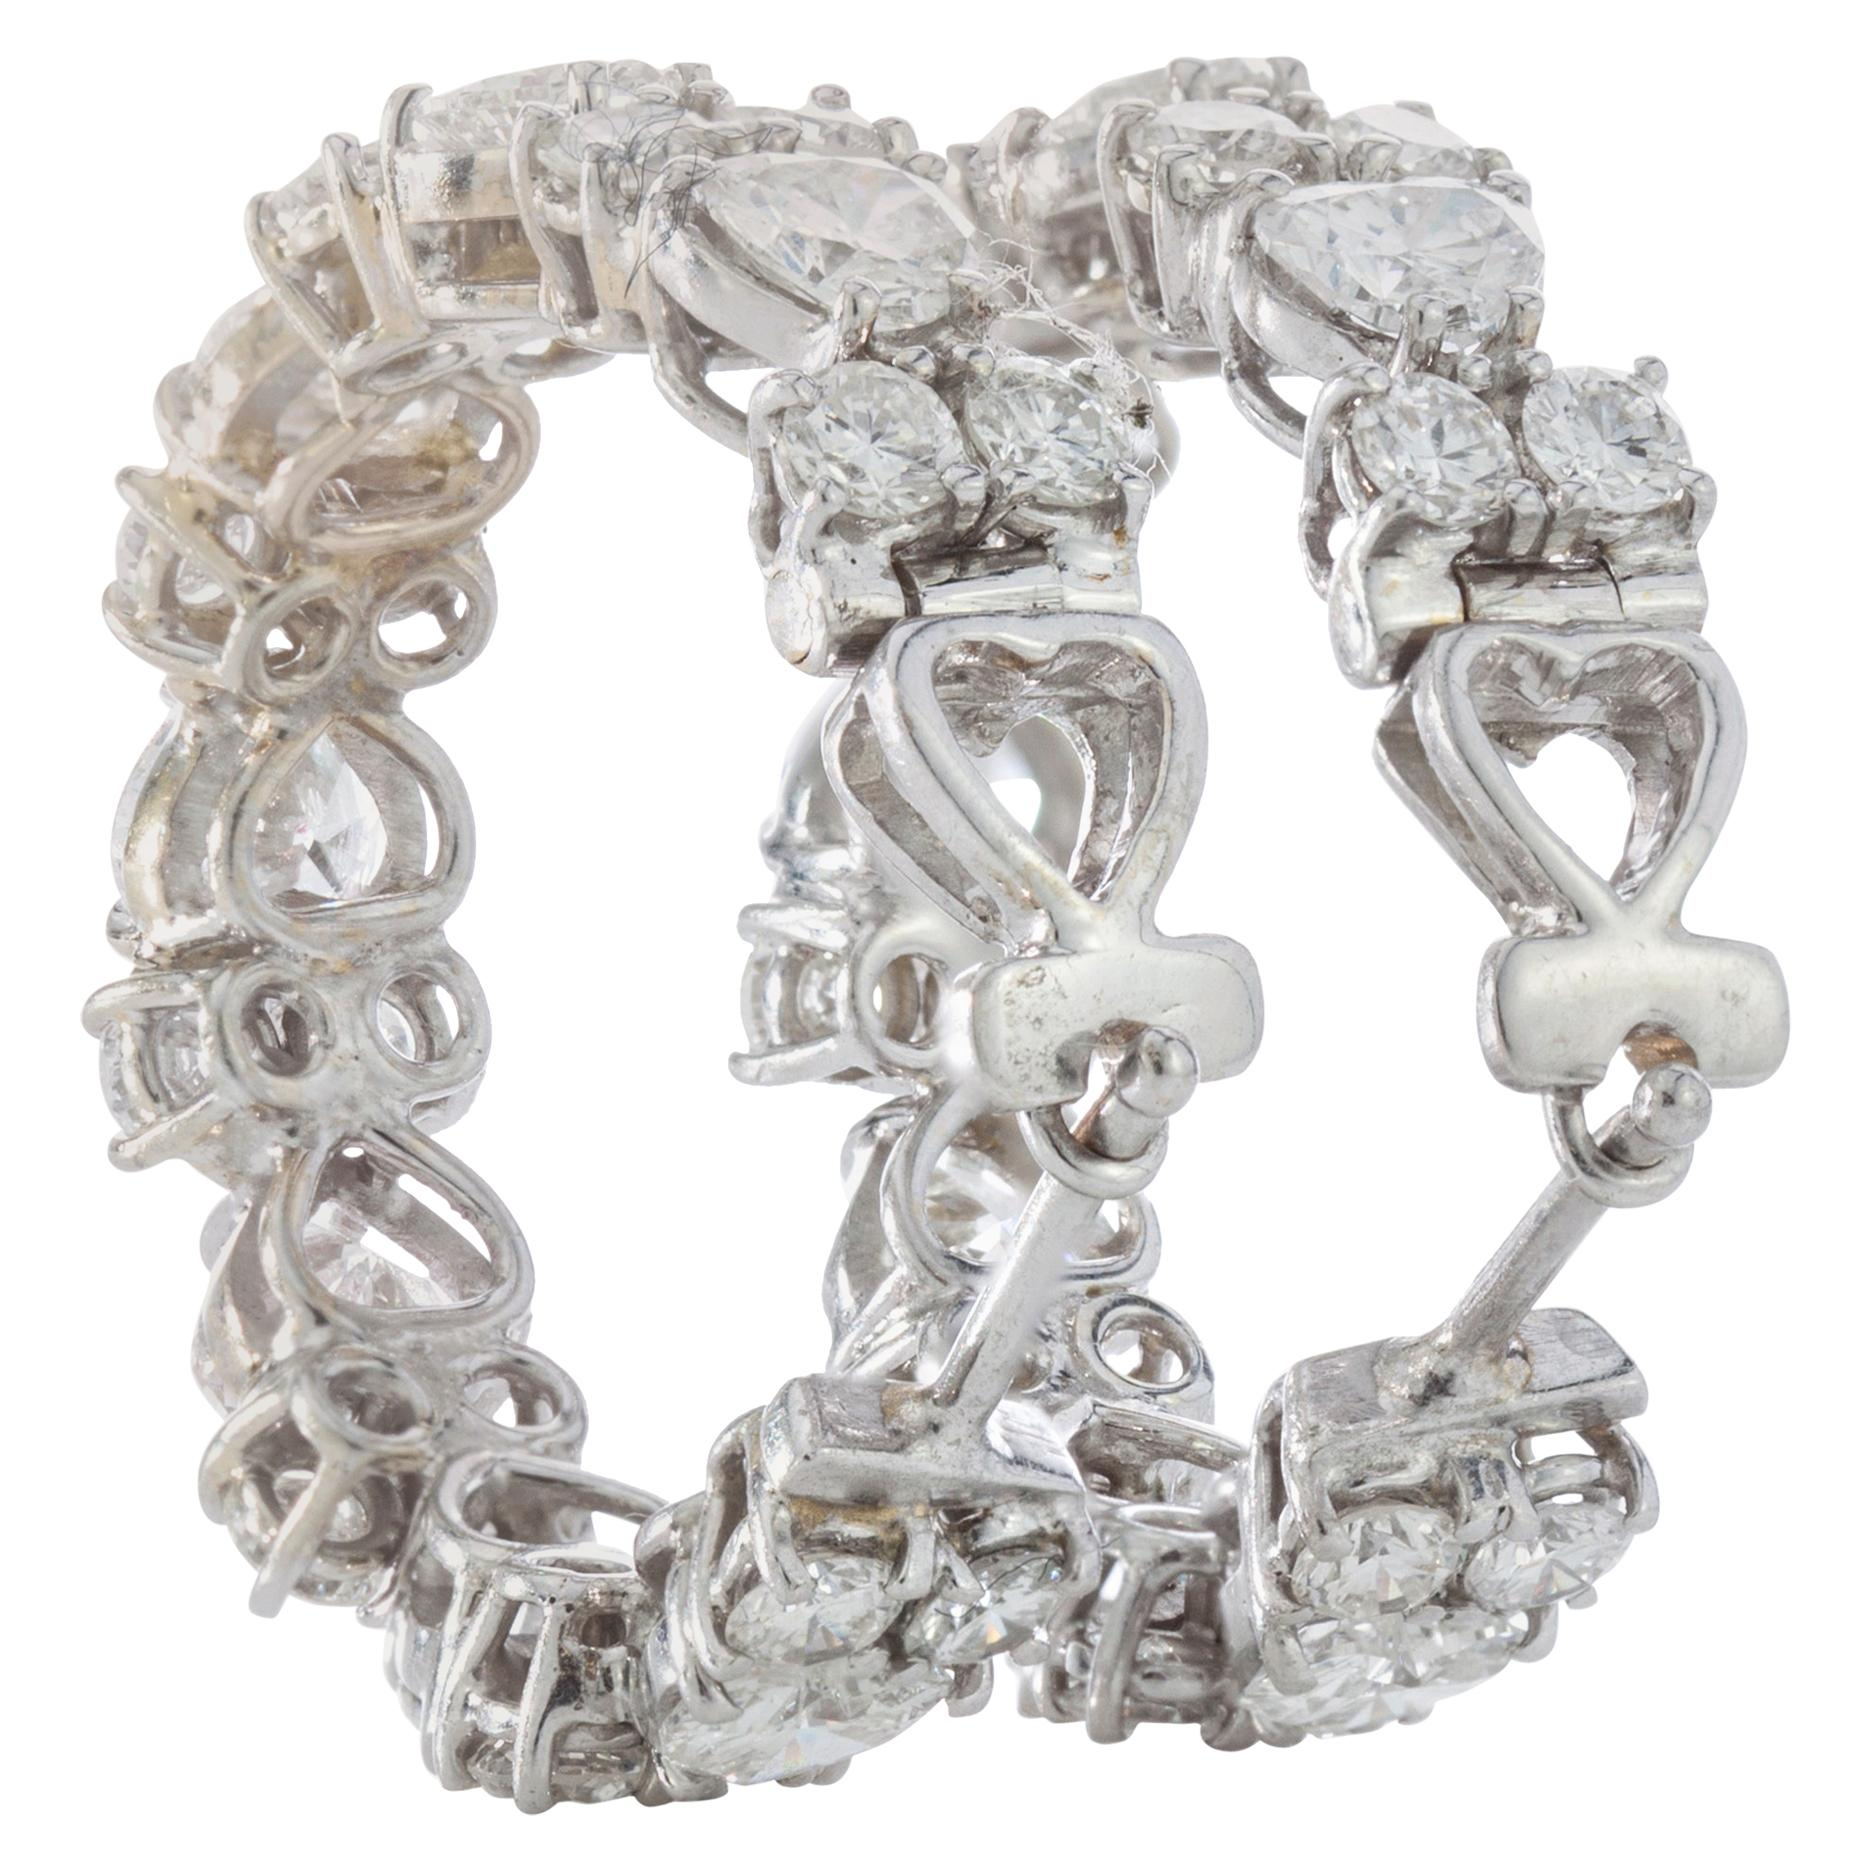 18 Karat White Gold Ladies Clip-On Earrings with Heart Cut Diamonds